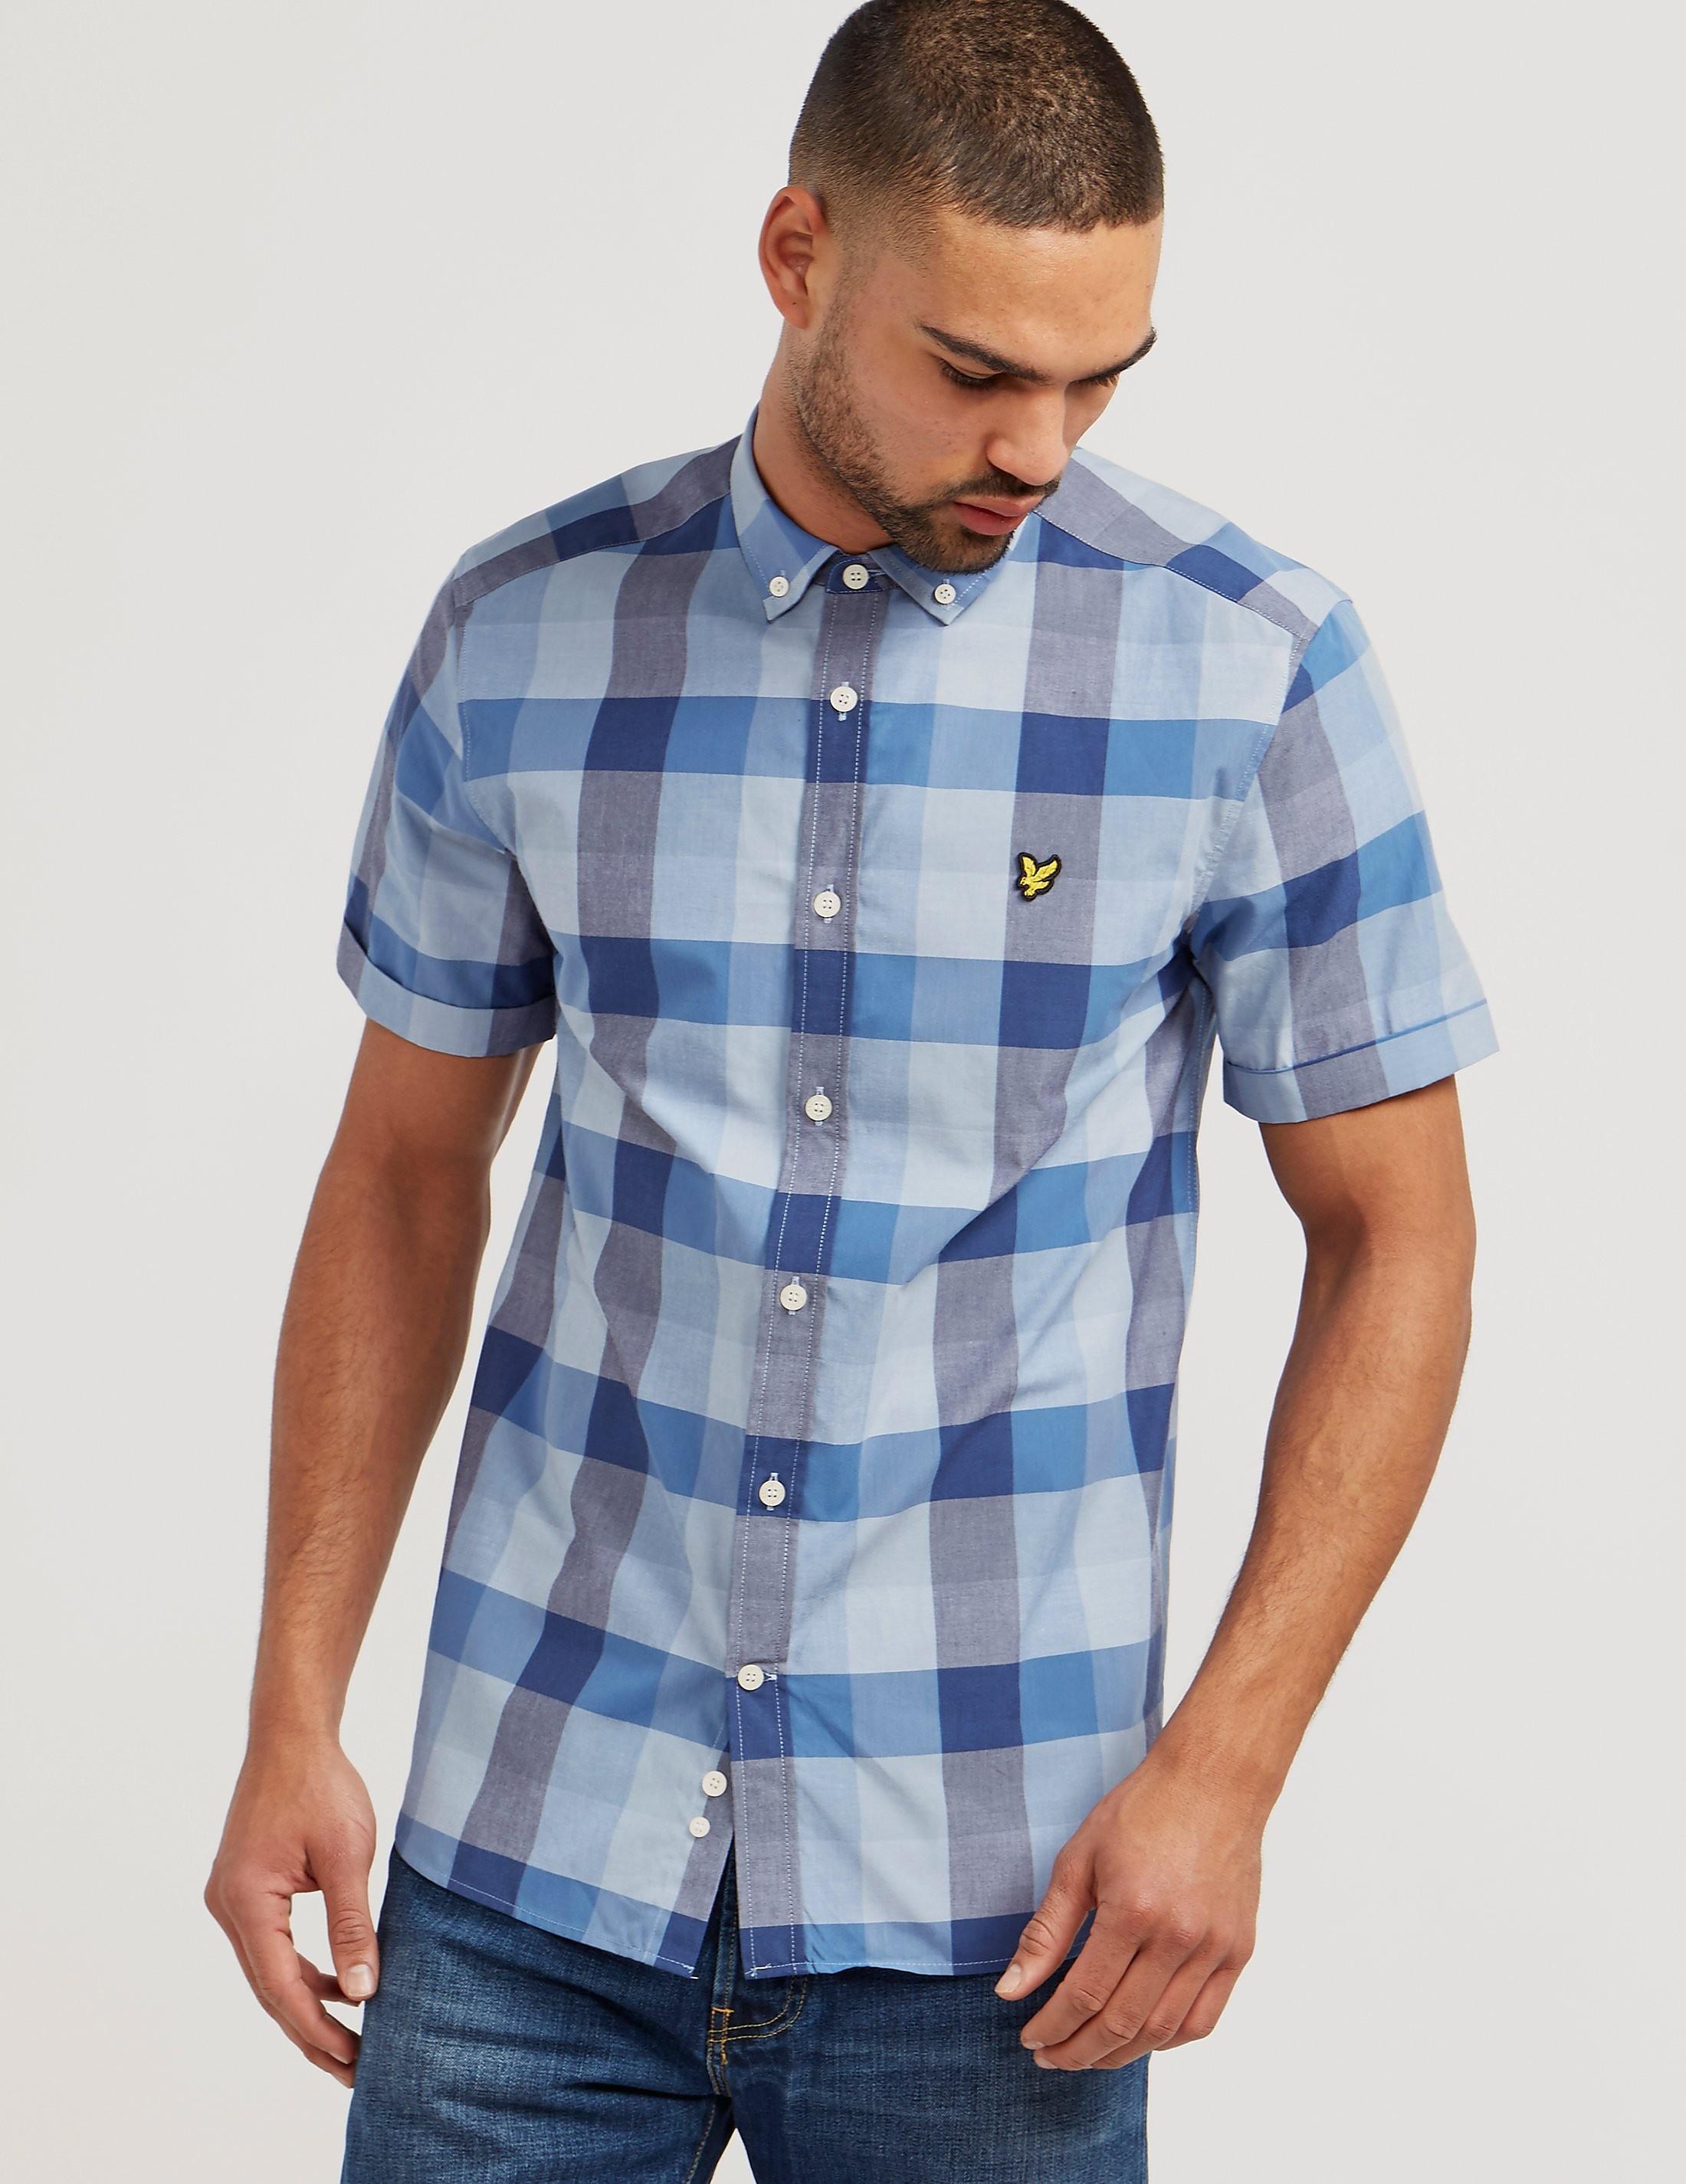 Lyle & Scott Bold Check Short Sleeve Shirt